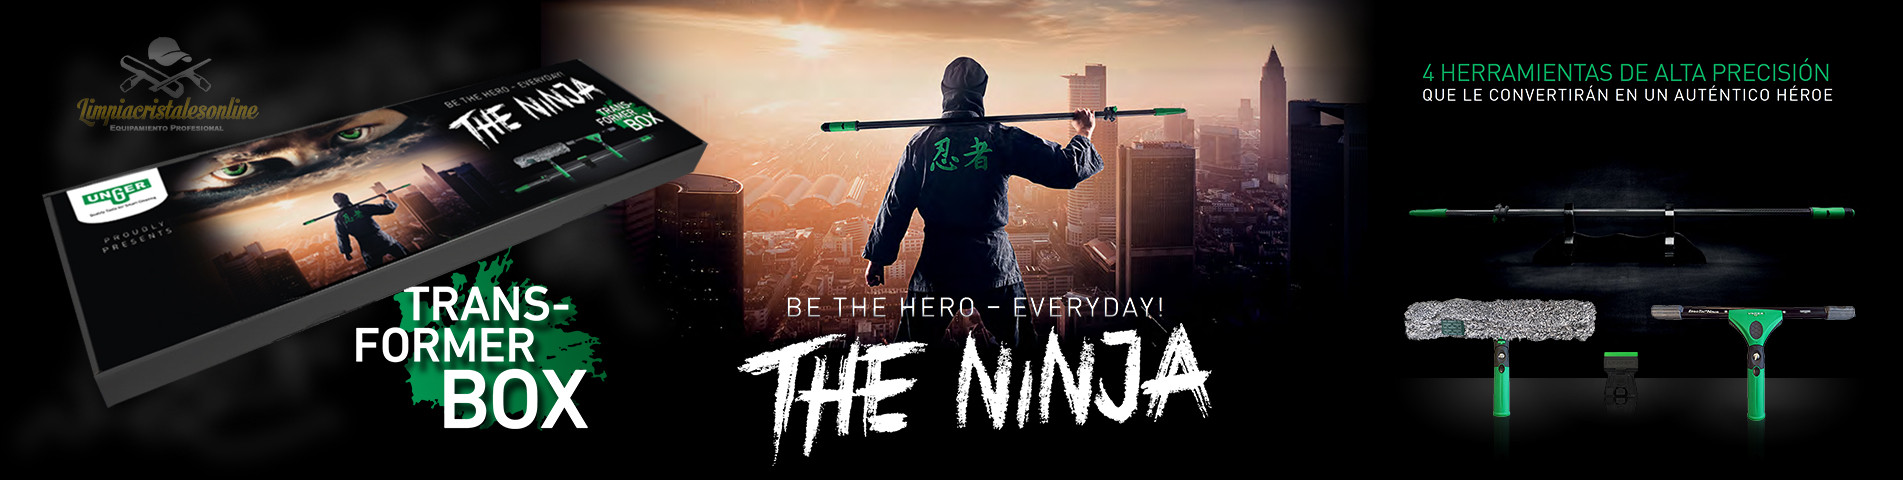 Unger Ninja - Edición limitada